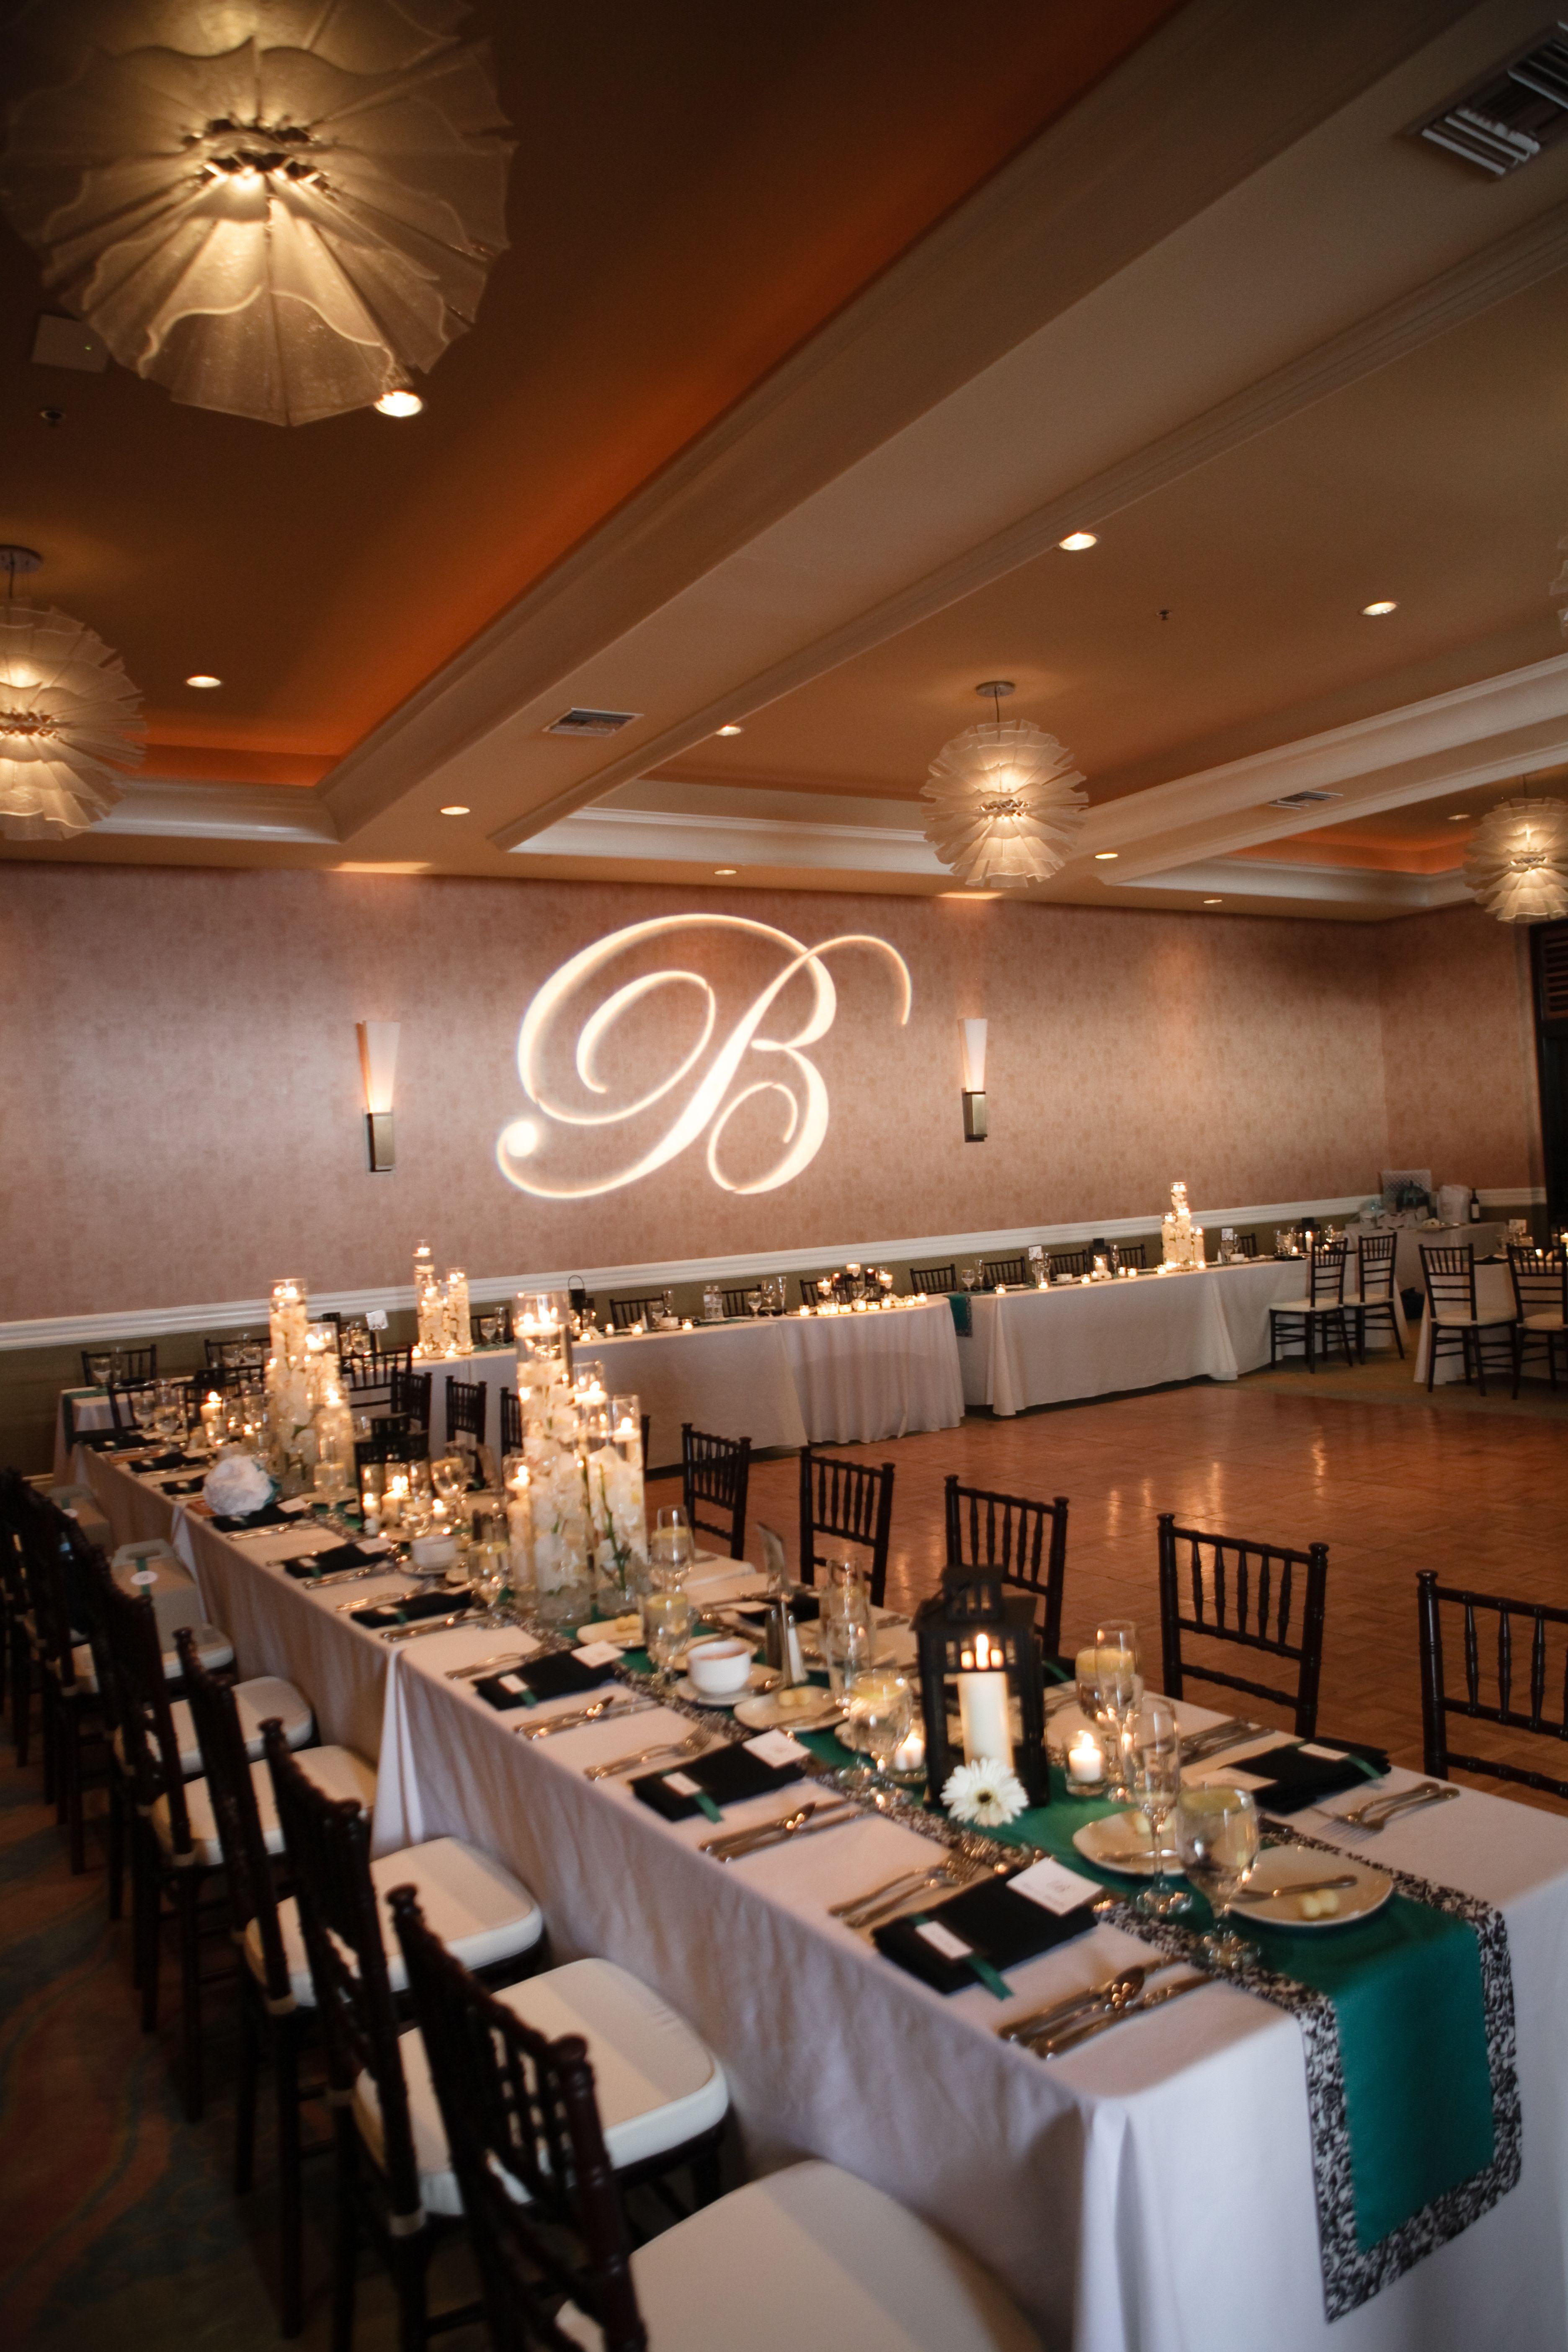 Pin By Rajee Pandi On Island I Do S Contest San Diego Wedding Venues Wedding Venues Beach Wedding Reception Venues